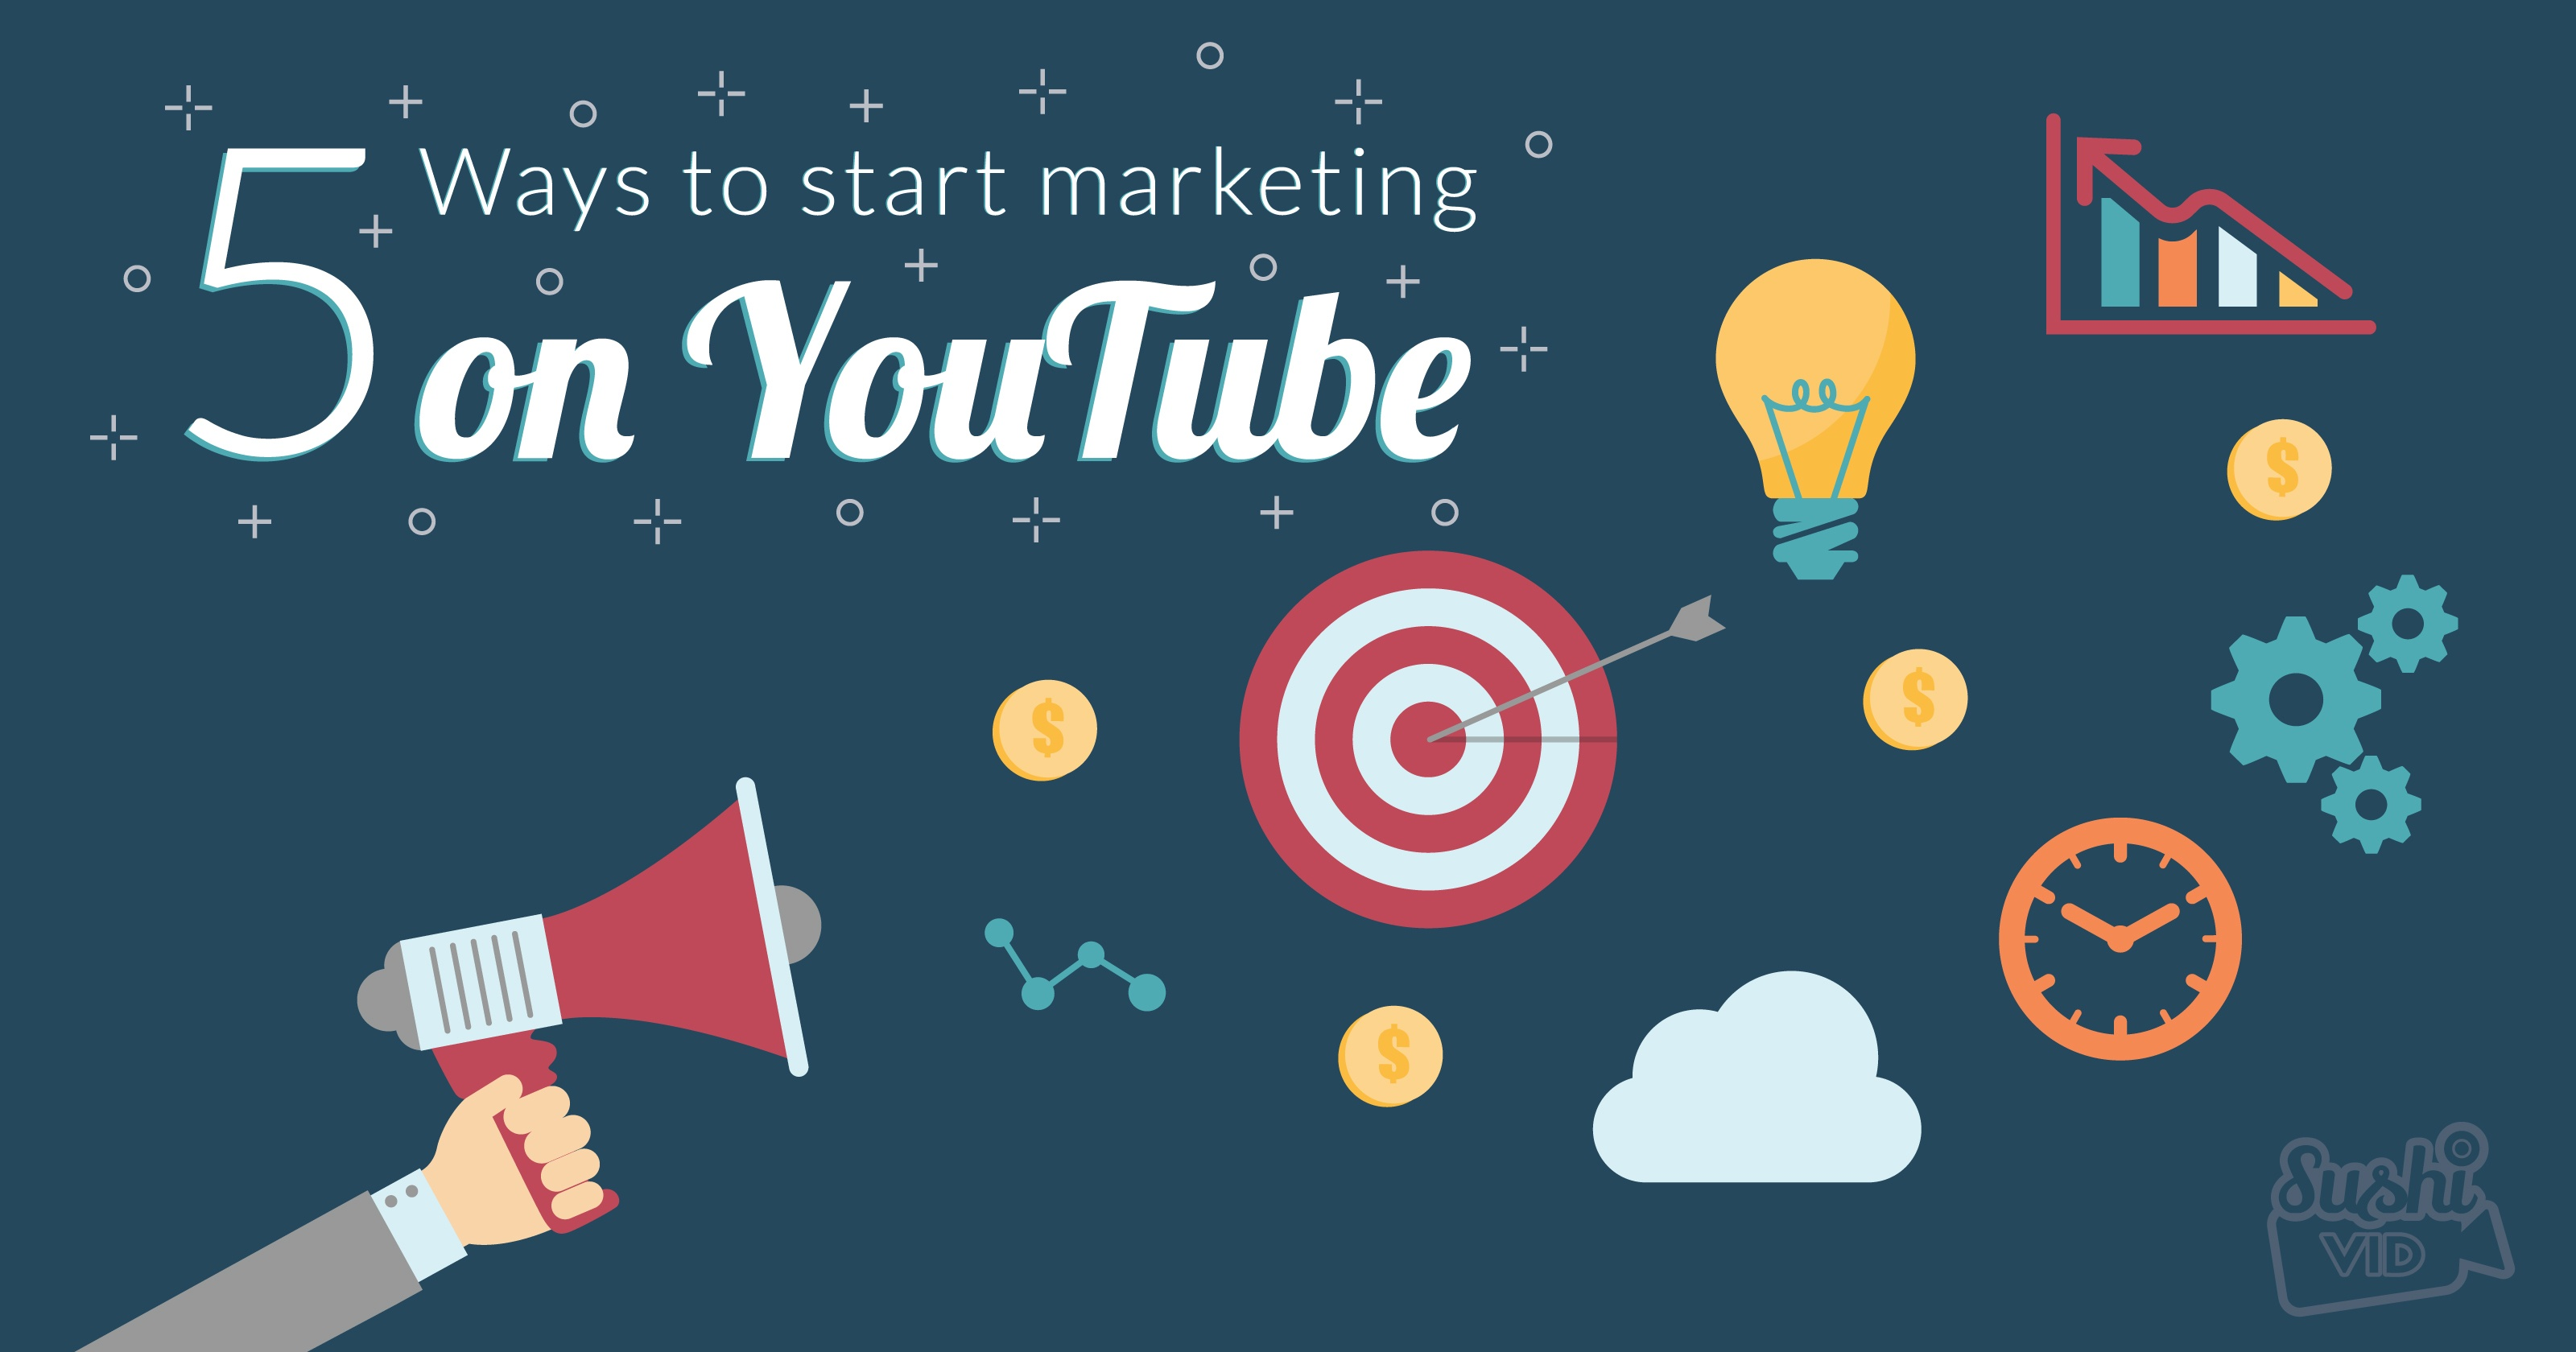 20151118 - 5 Ways to Start Marketing on YouTube - Influencer Marketing.jpg